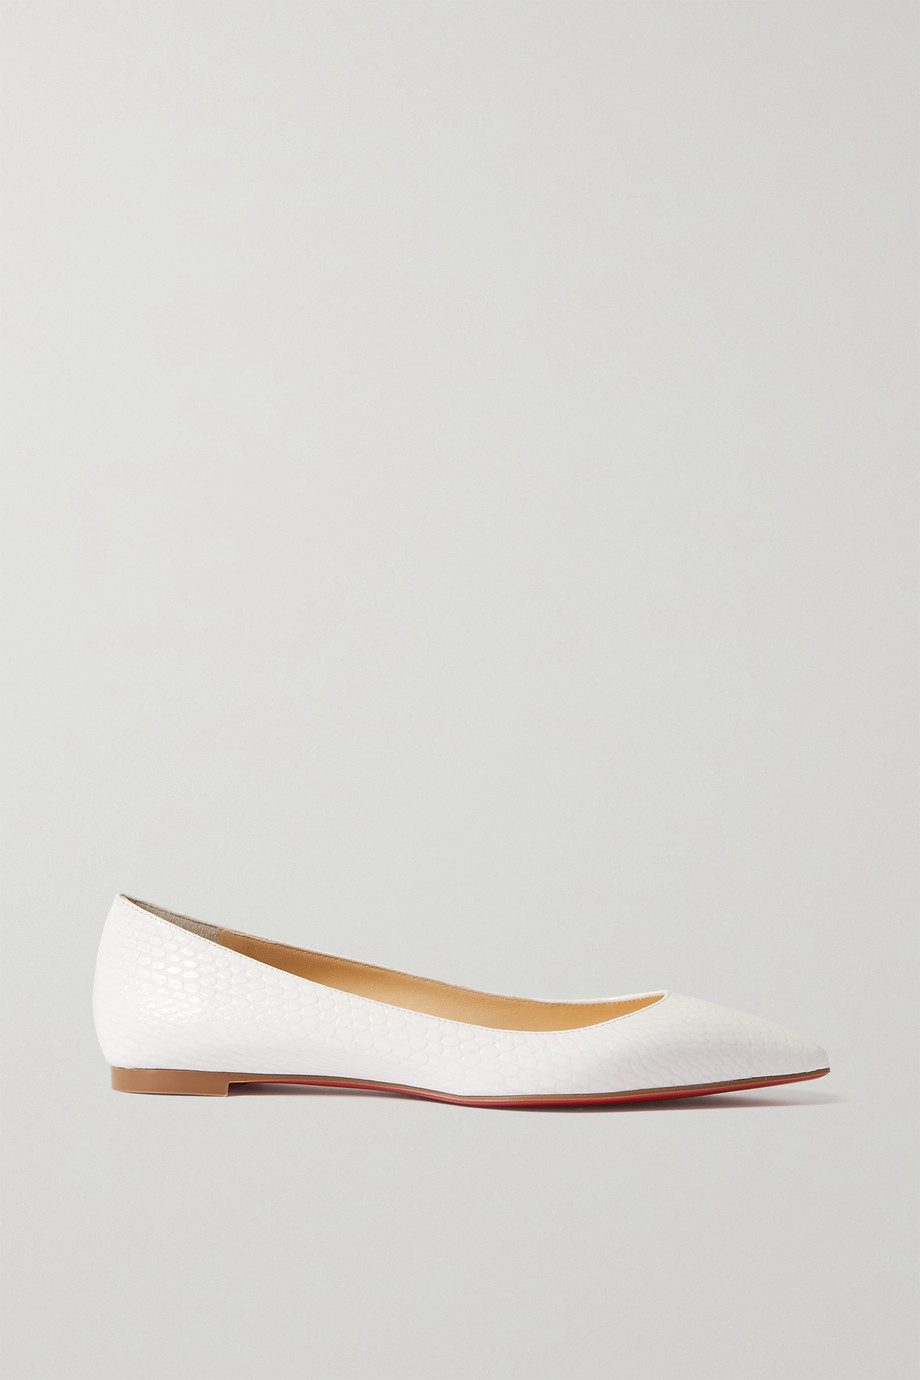 Christian Louboutin Ballalla lizard-effect leather point-toe flats